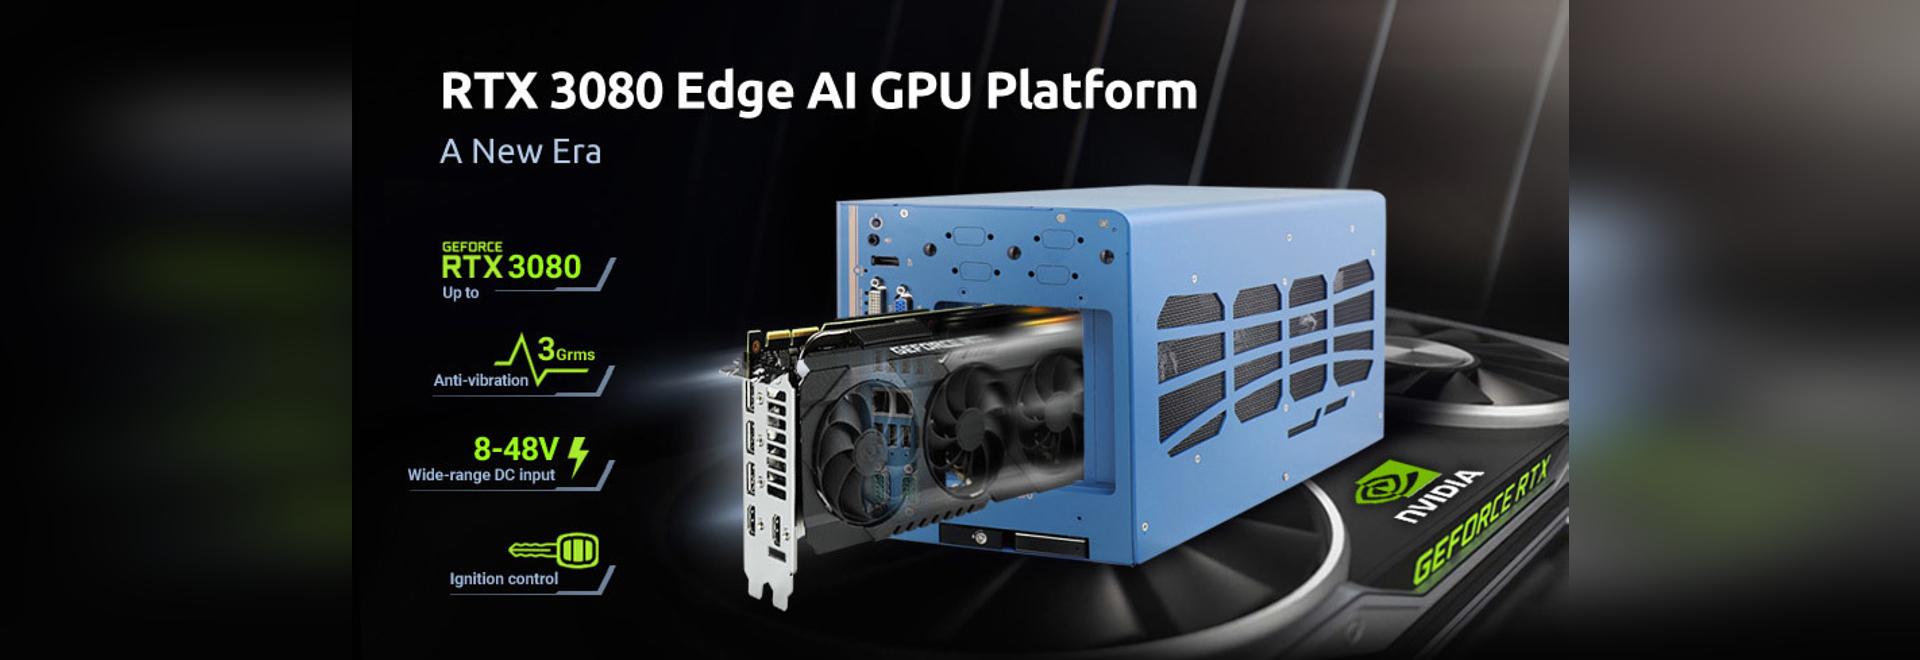 Neousys New Edge AI GPU Computing Platform with NVIDIA® RTX 30 series